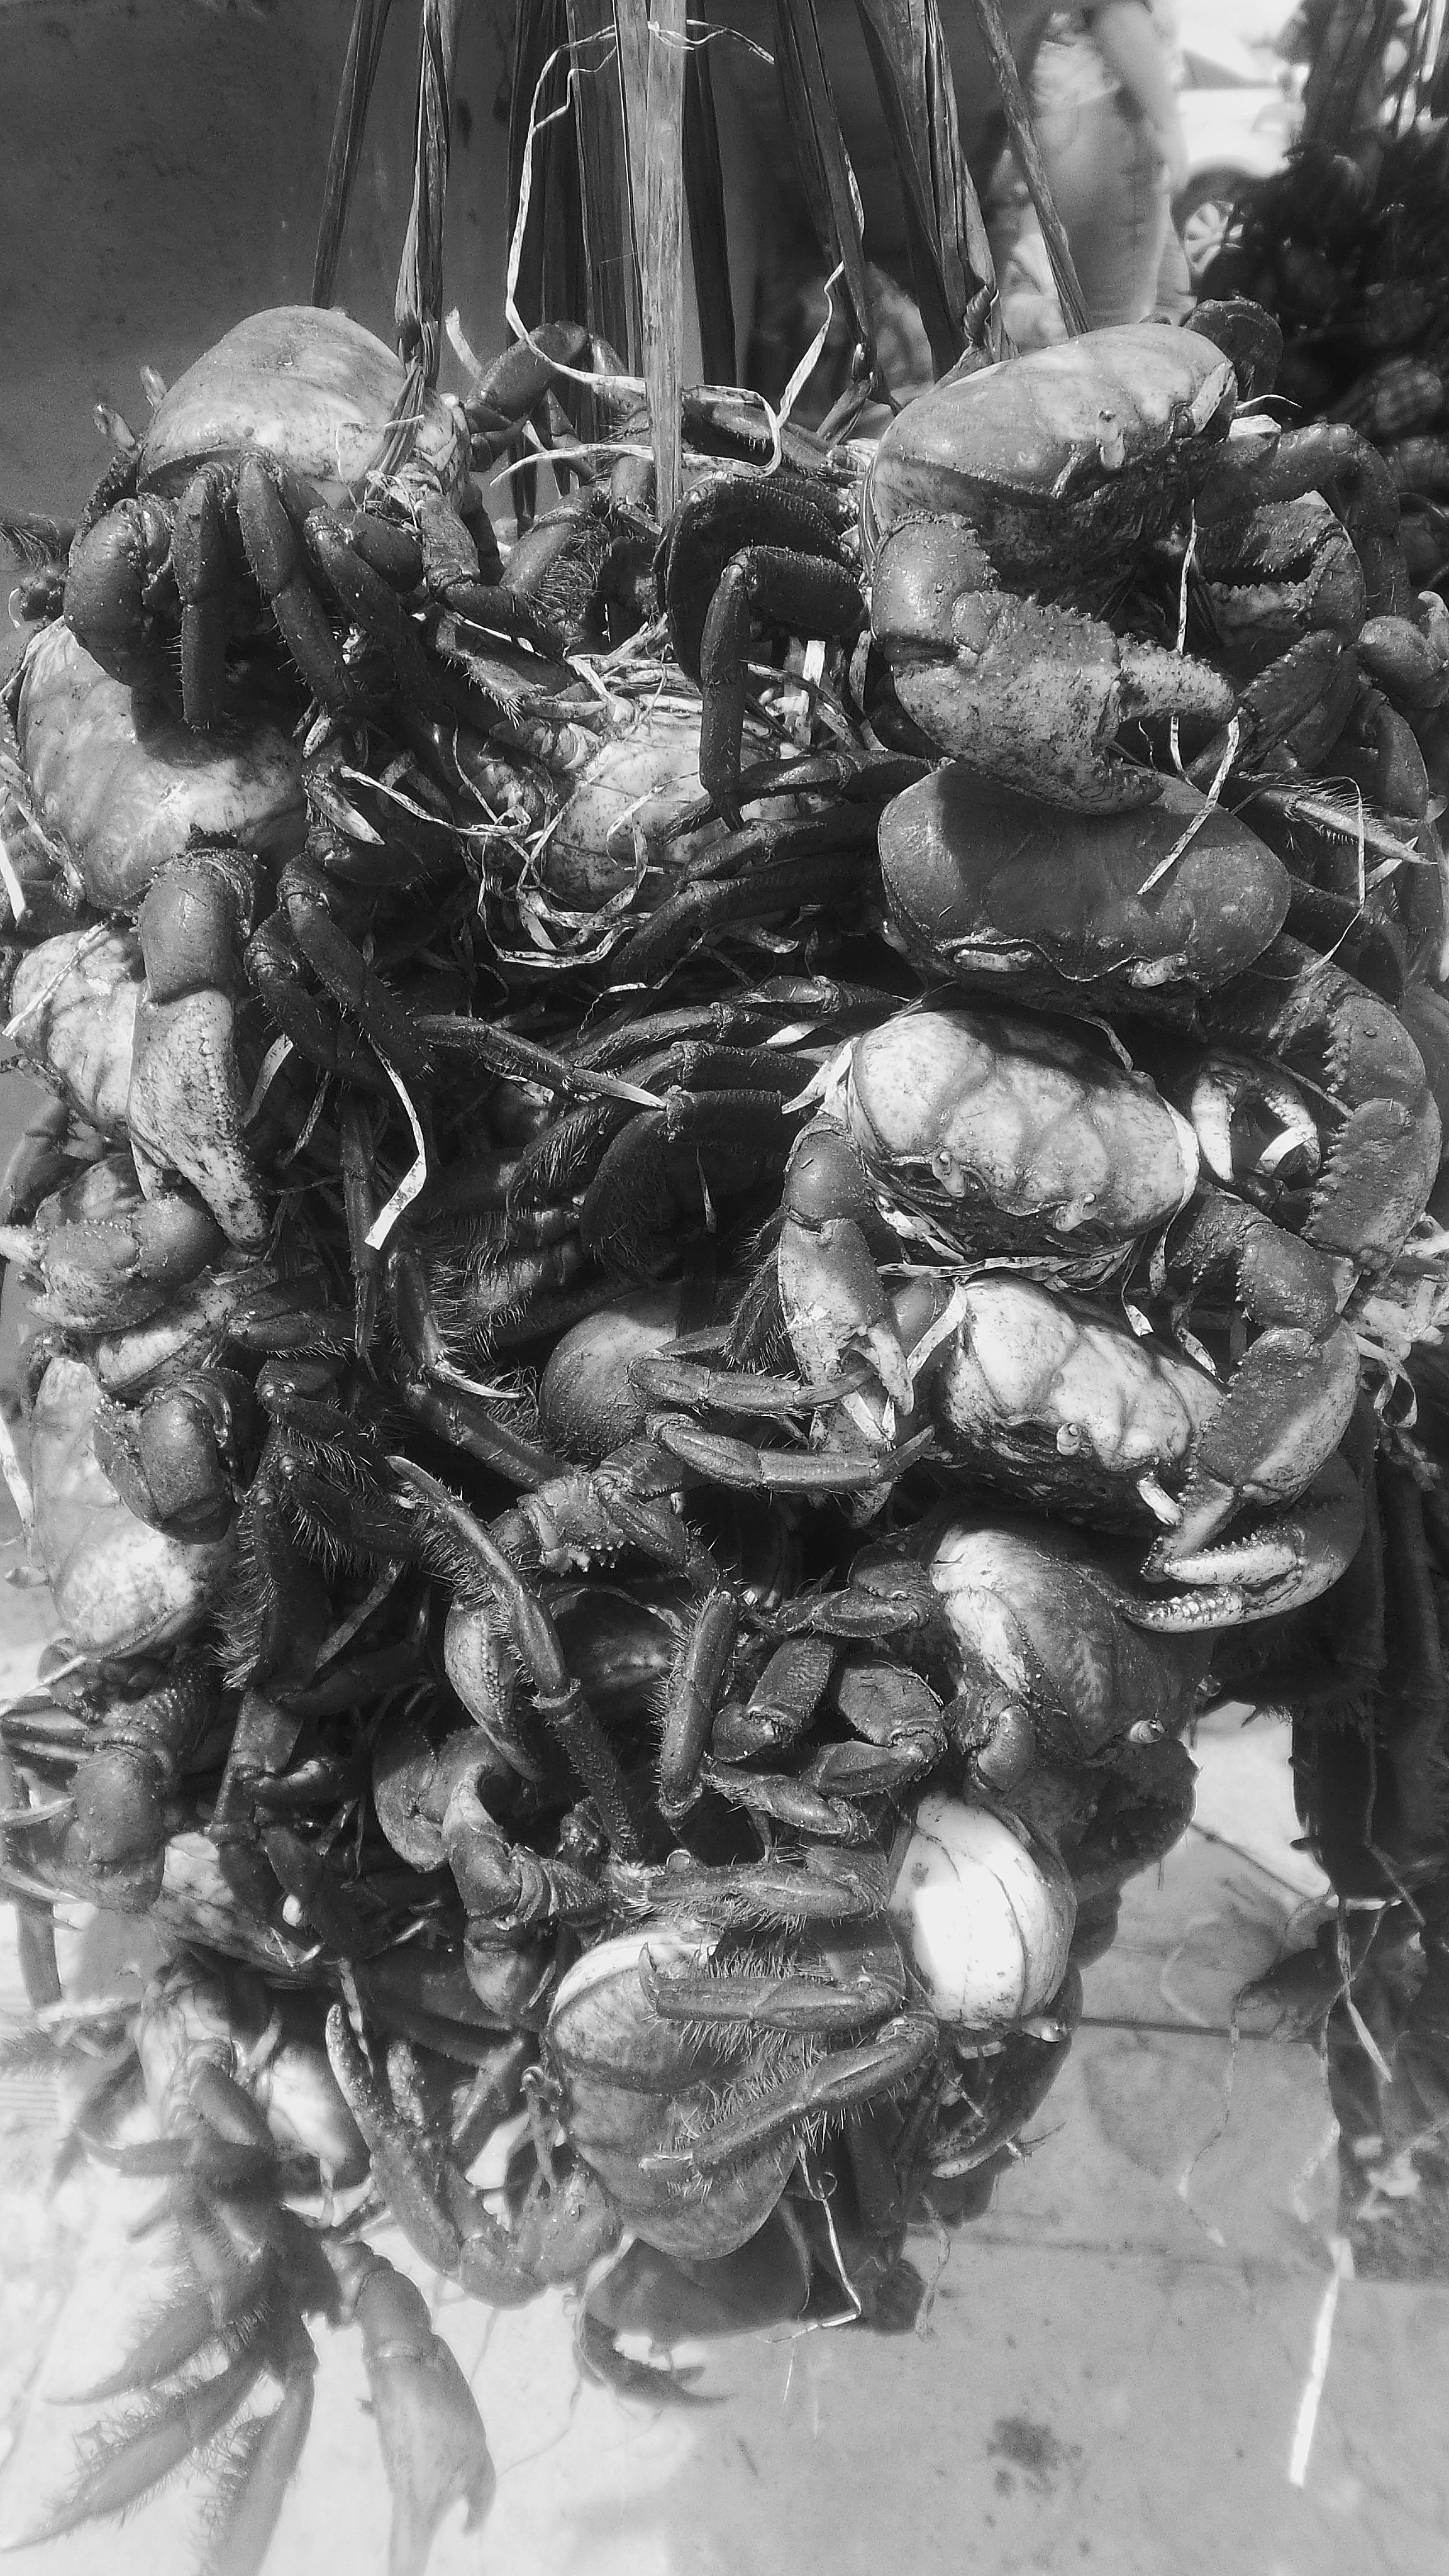 Free stock photo of animal, animals, crab, crawfish